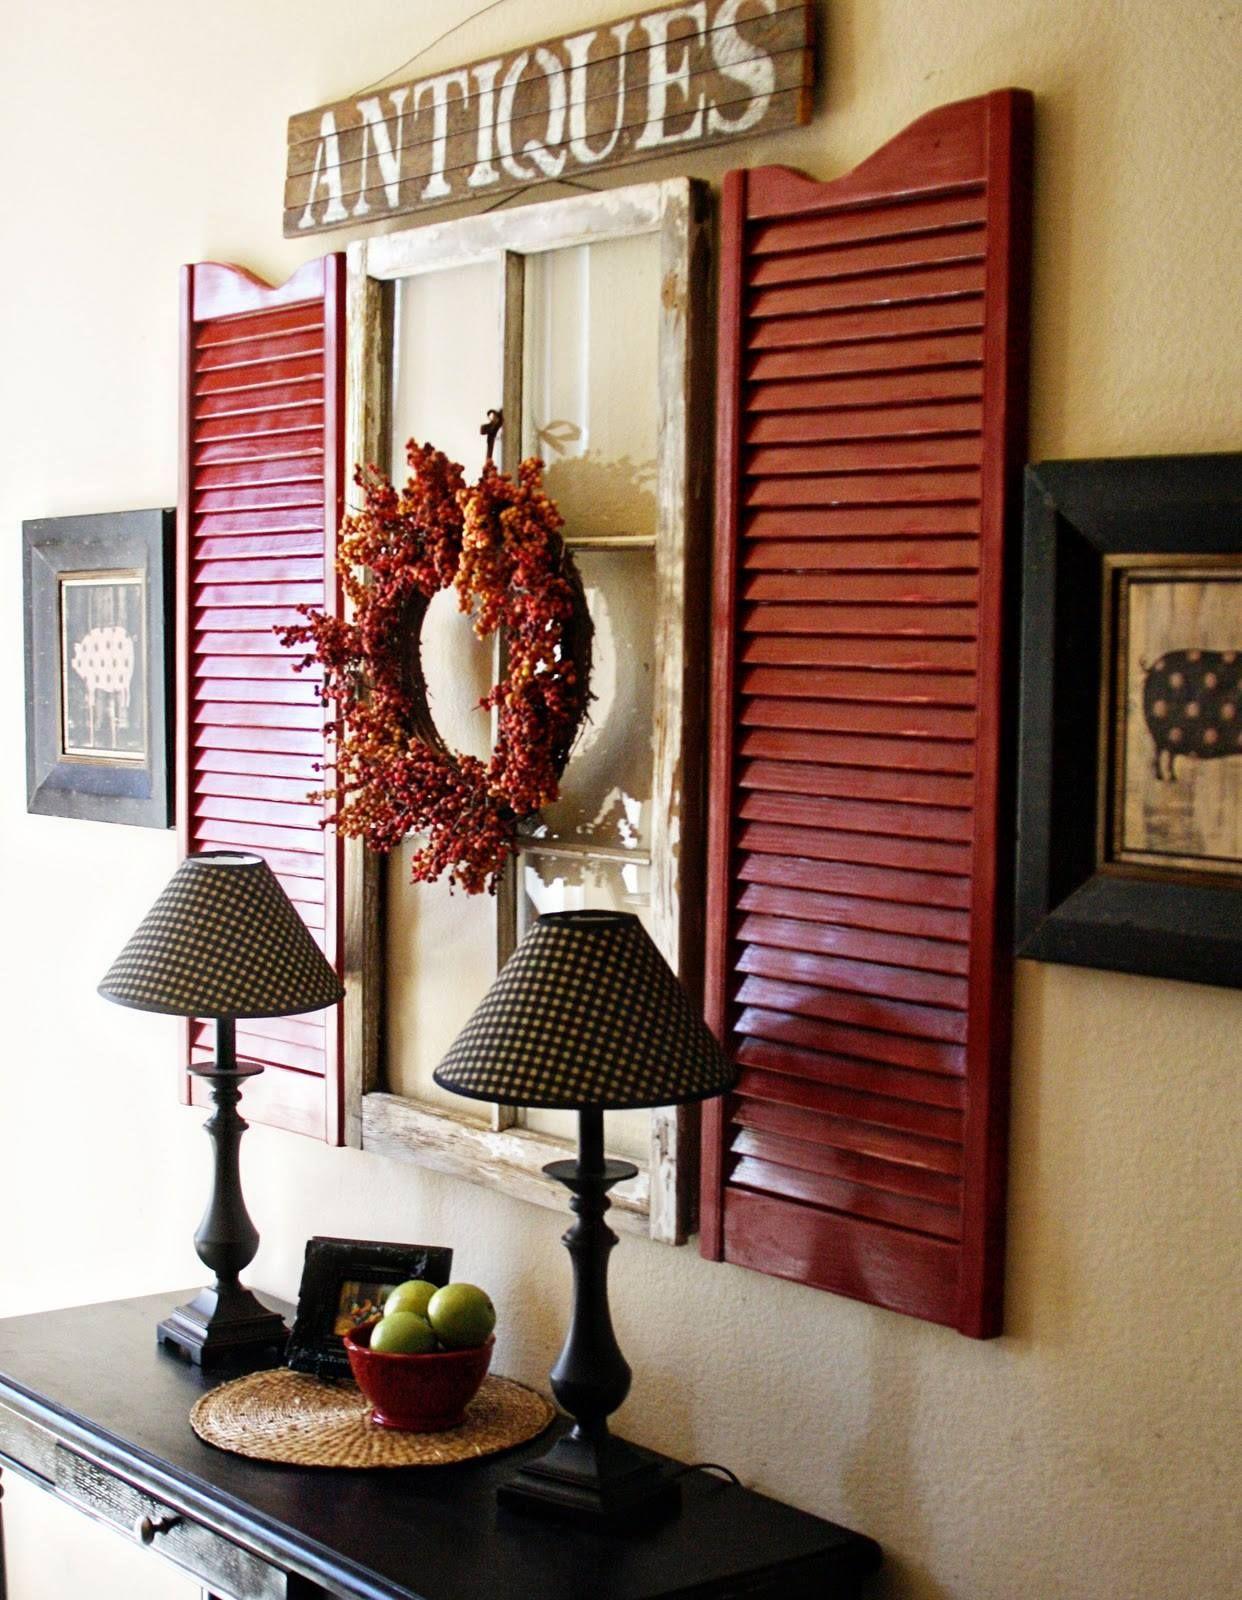 Rustic kitchen window decor  entrance way designs  yahoo canada image search results  glenda